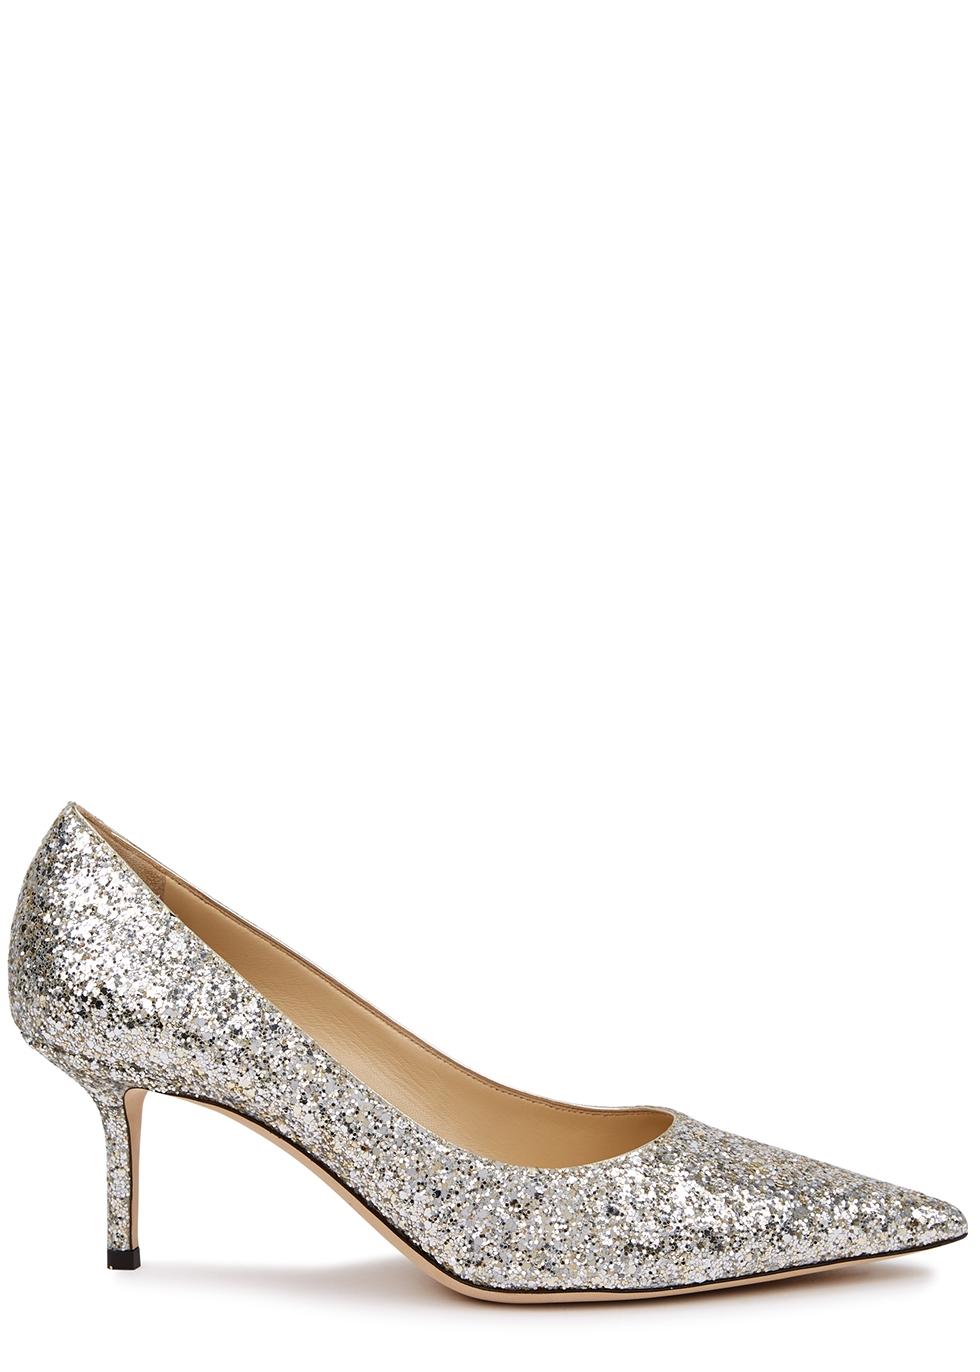 Love 85 silver glittered pumps